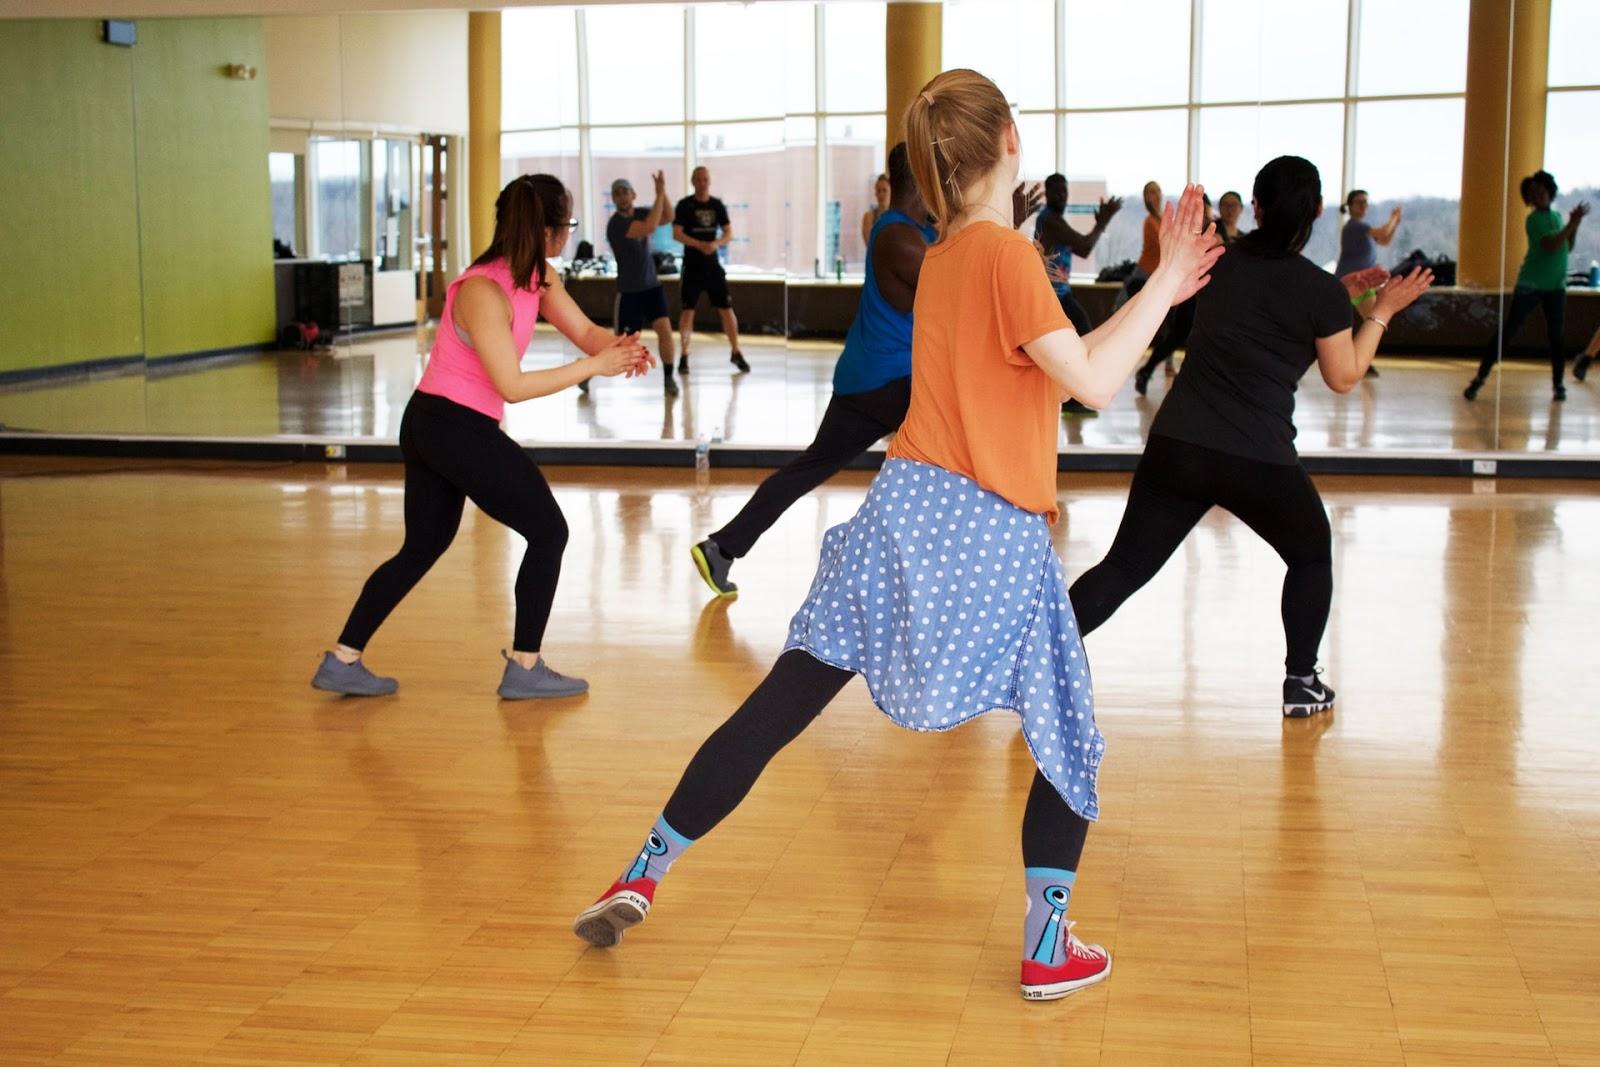 group of people dancing in a studio